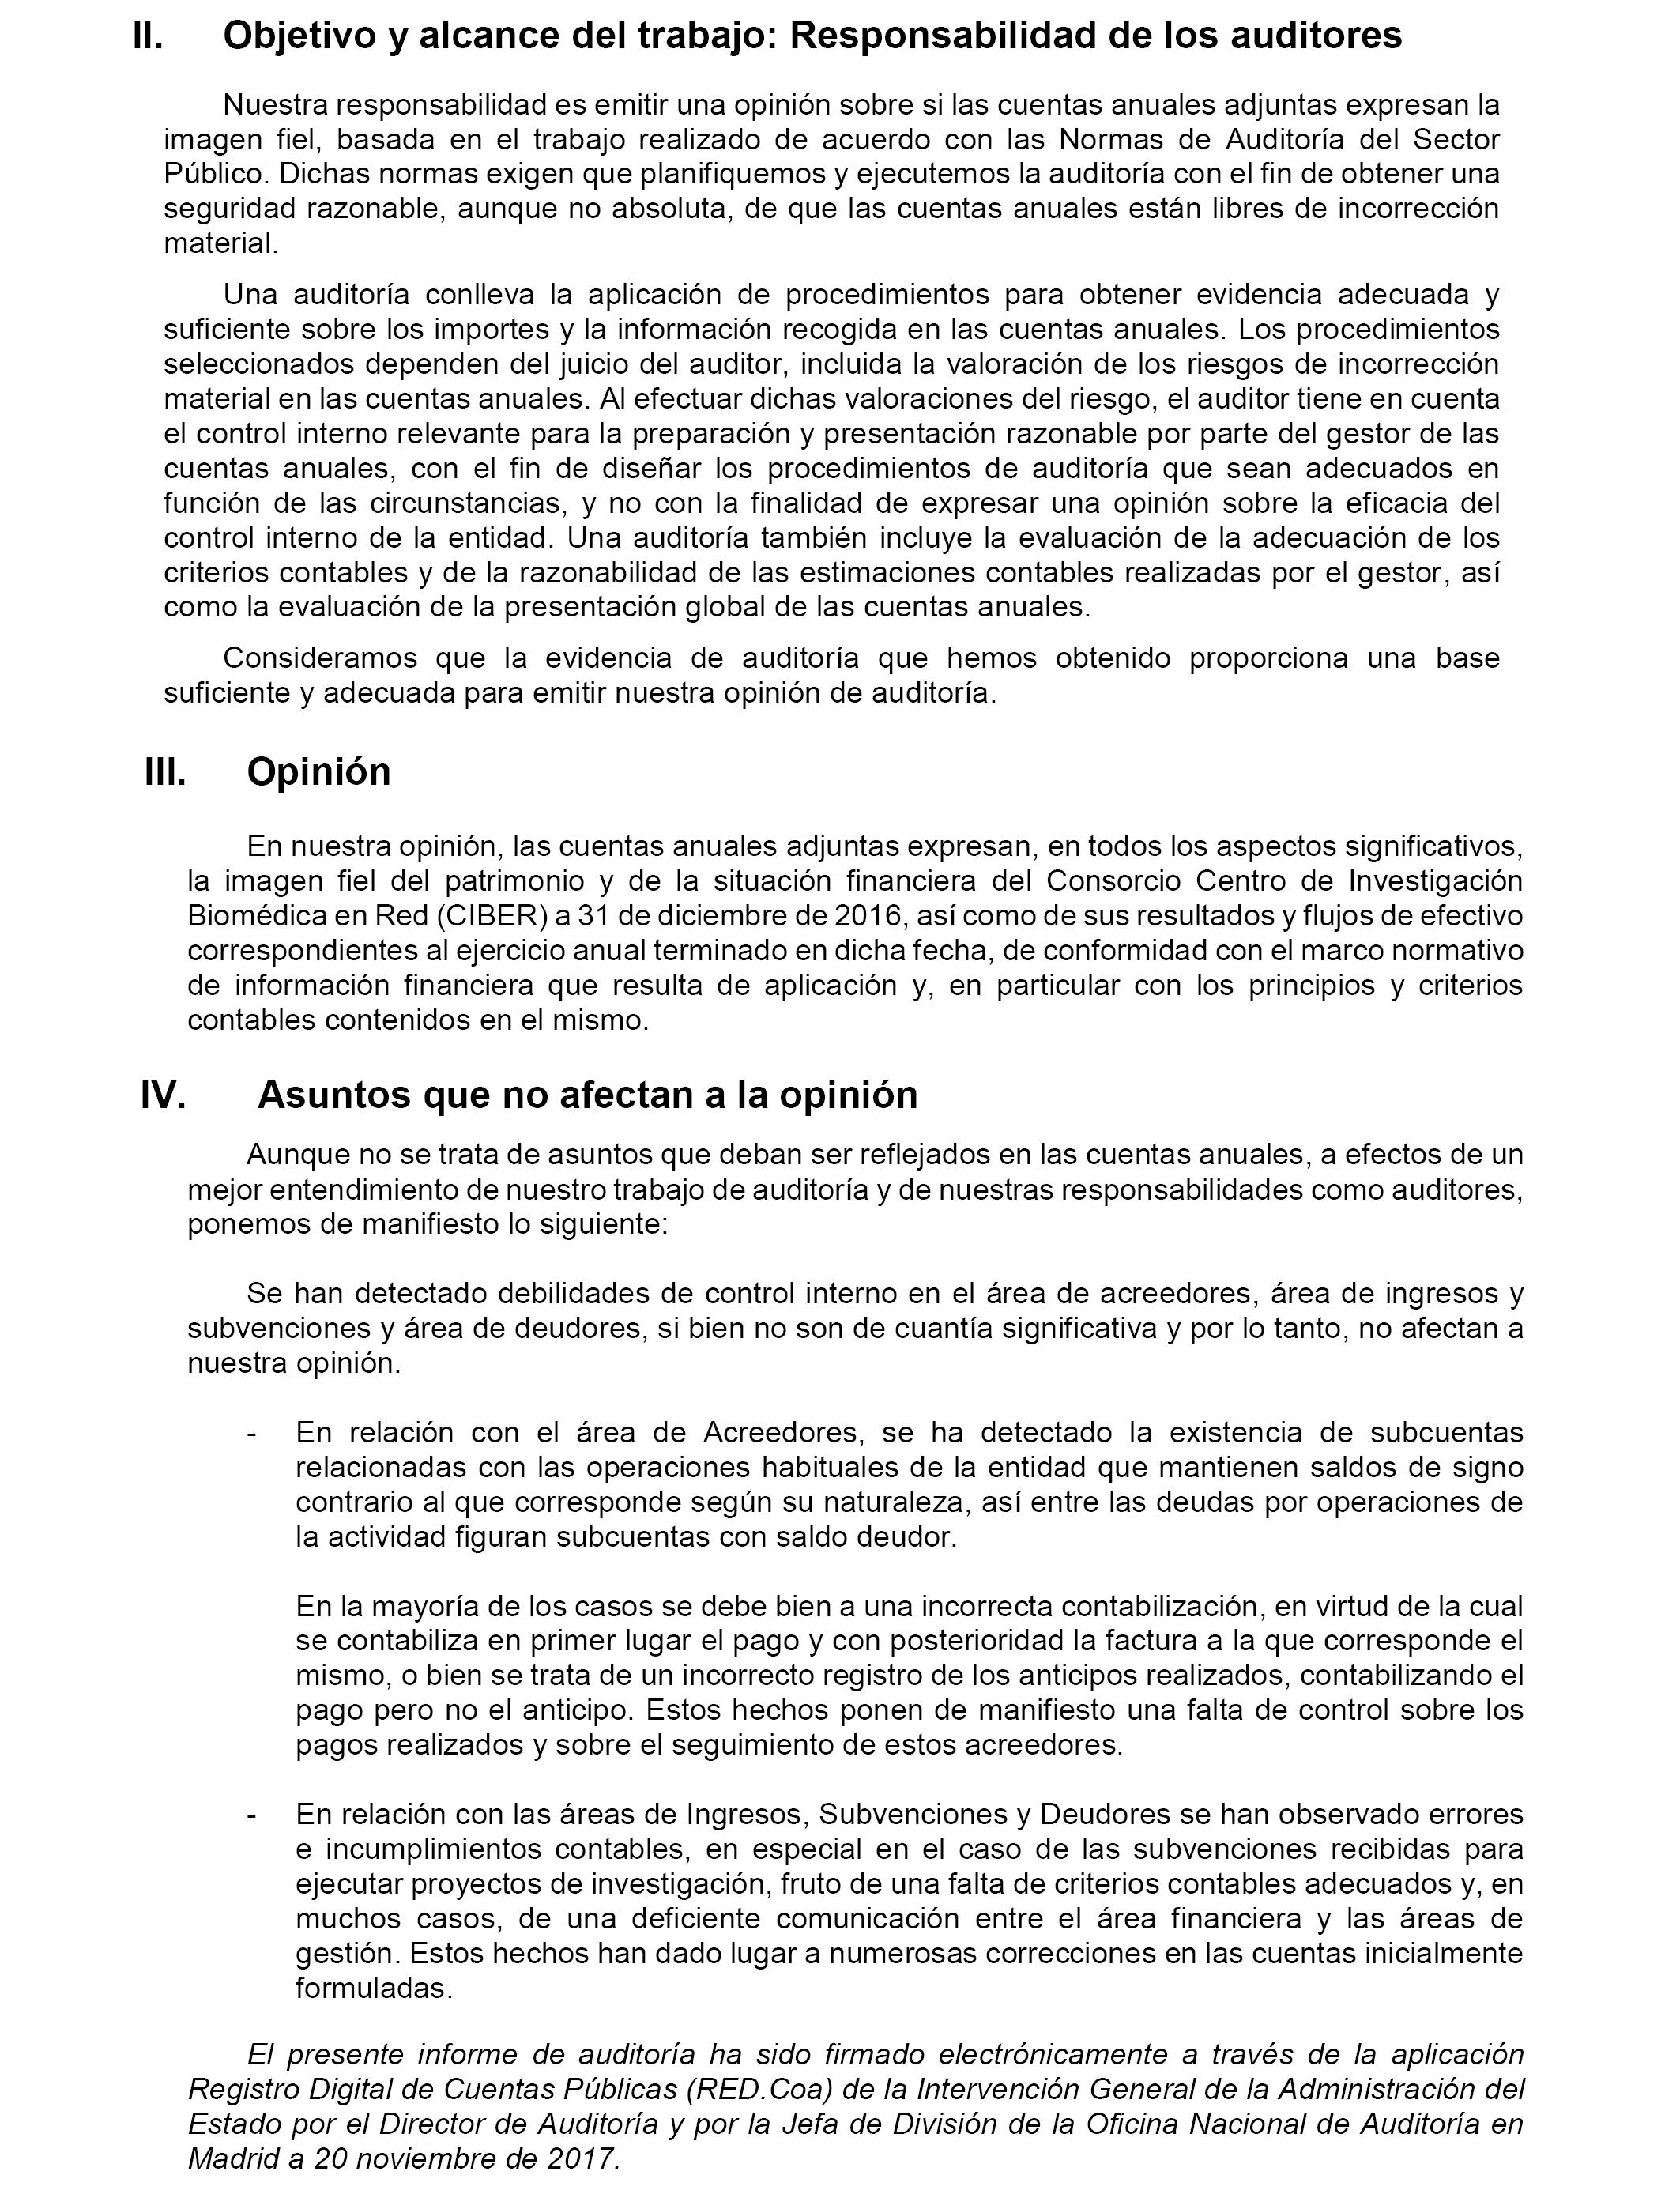 BOE.es - Documento BOE-A-2018-224